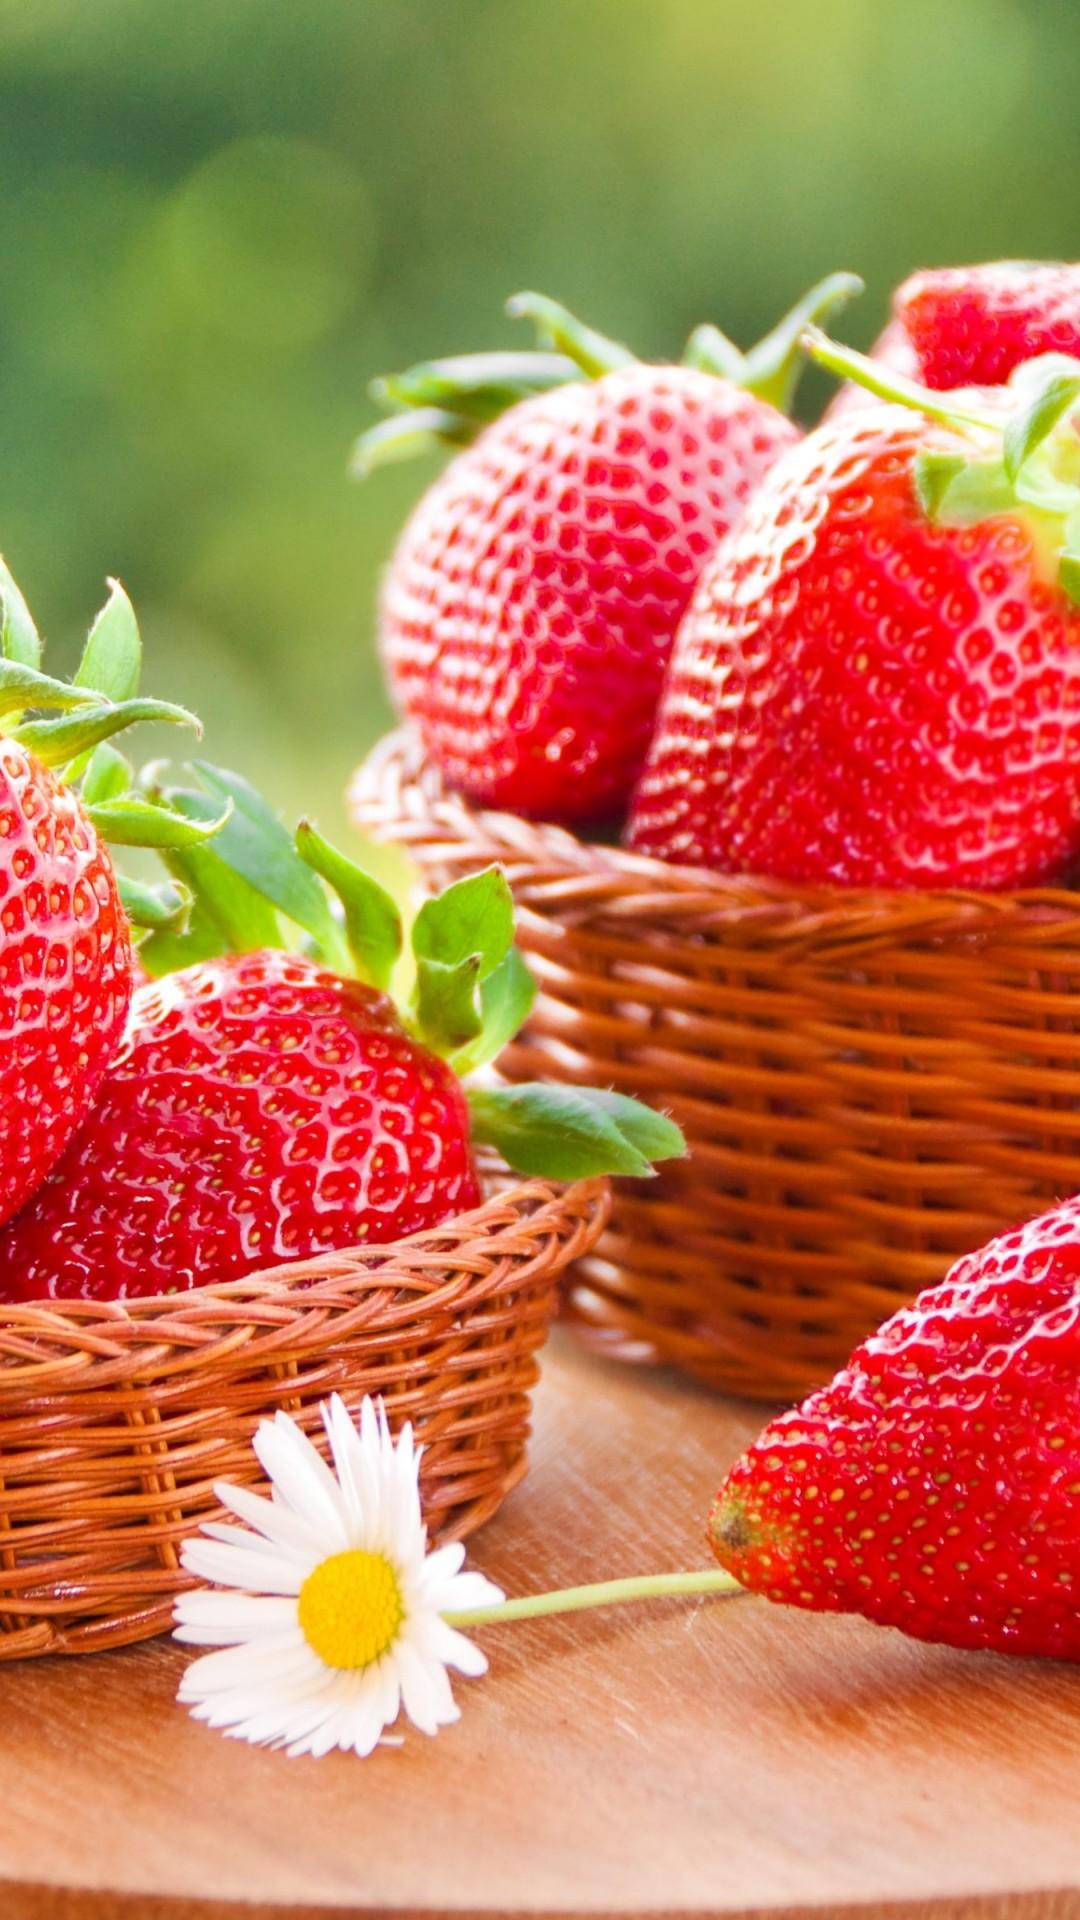 Wallpaper Strawberry 4k Food 15337